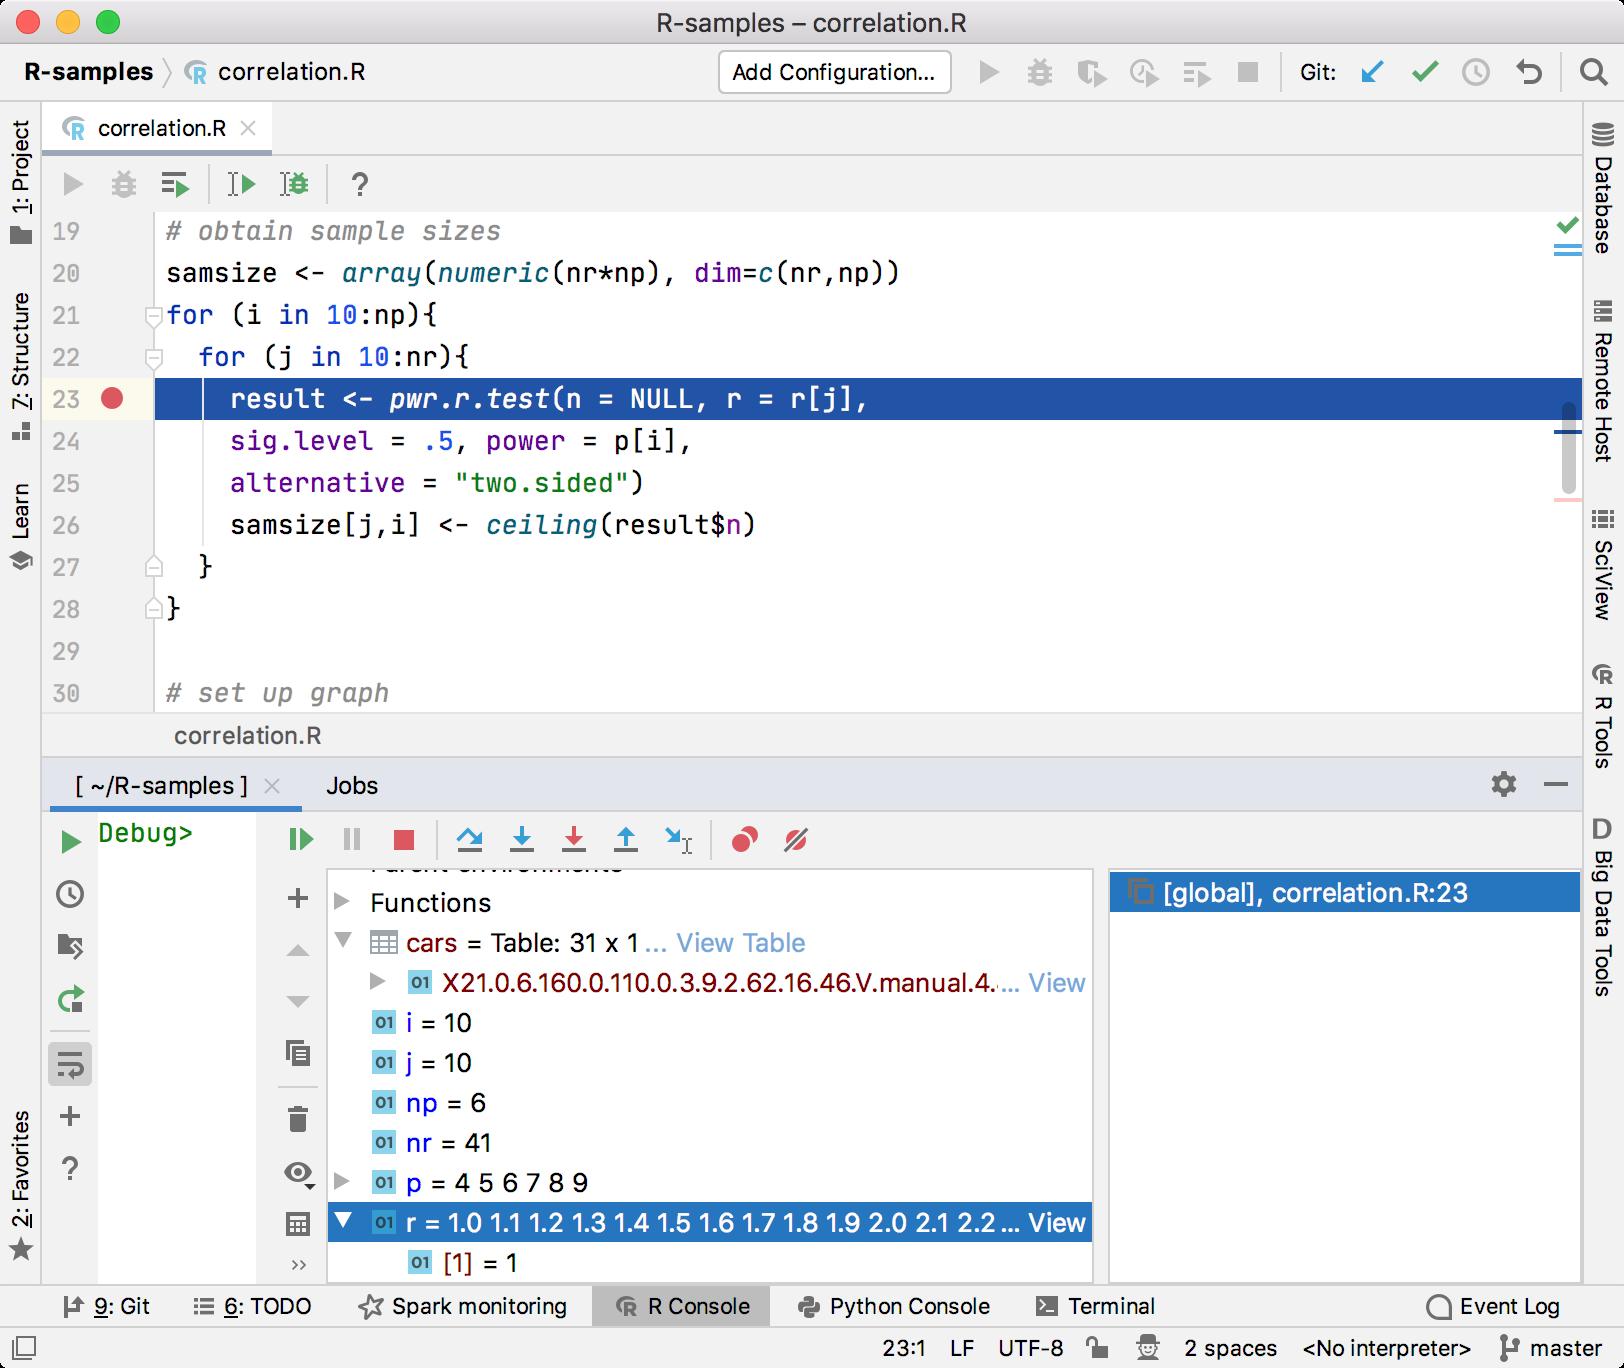 Debugging an R script in PyCharm